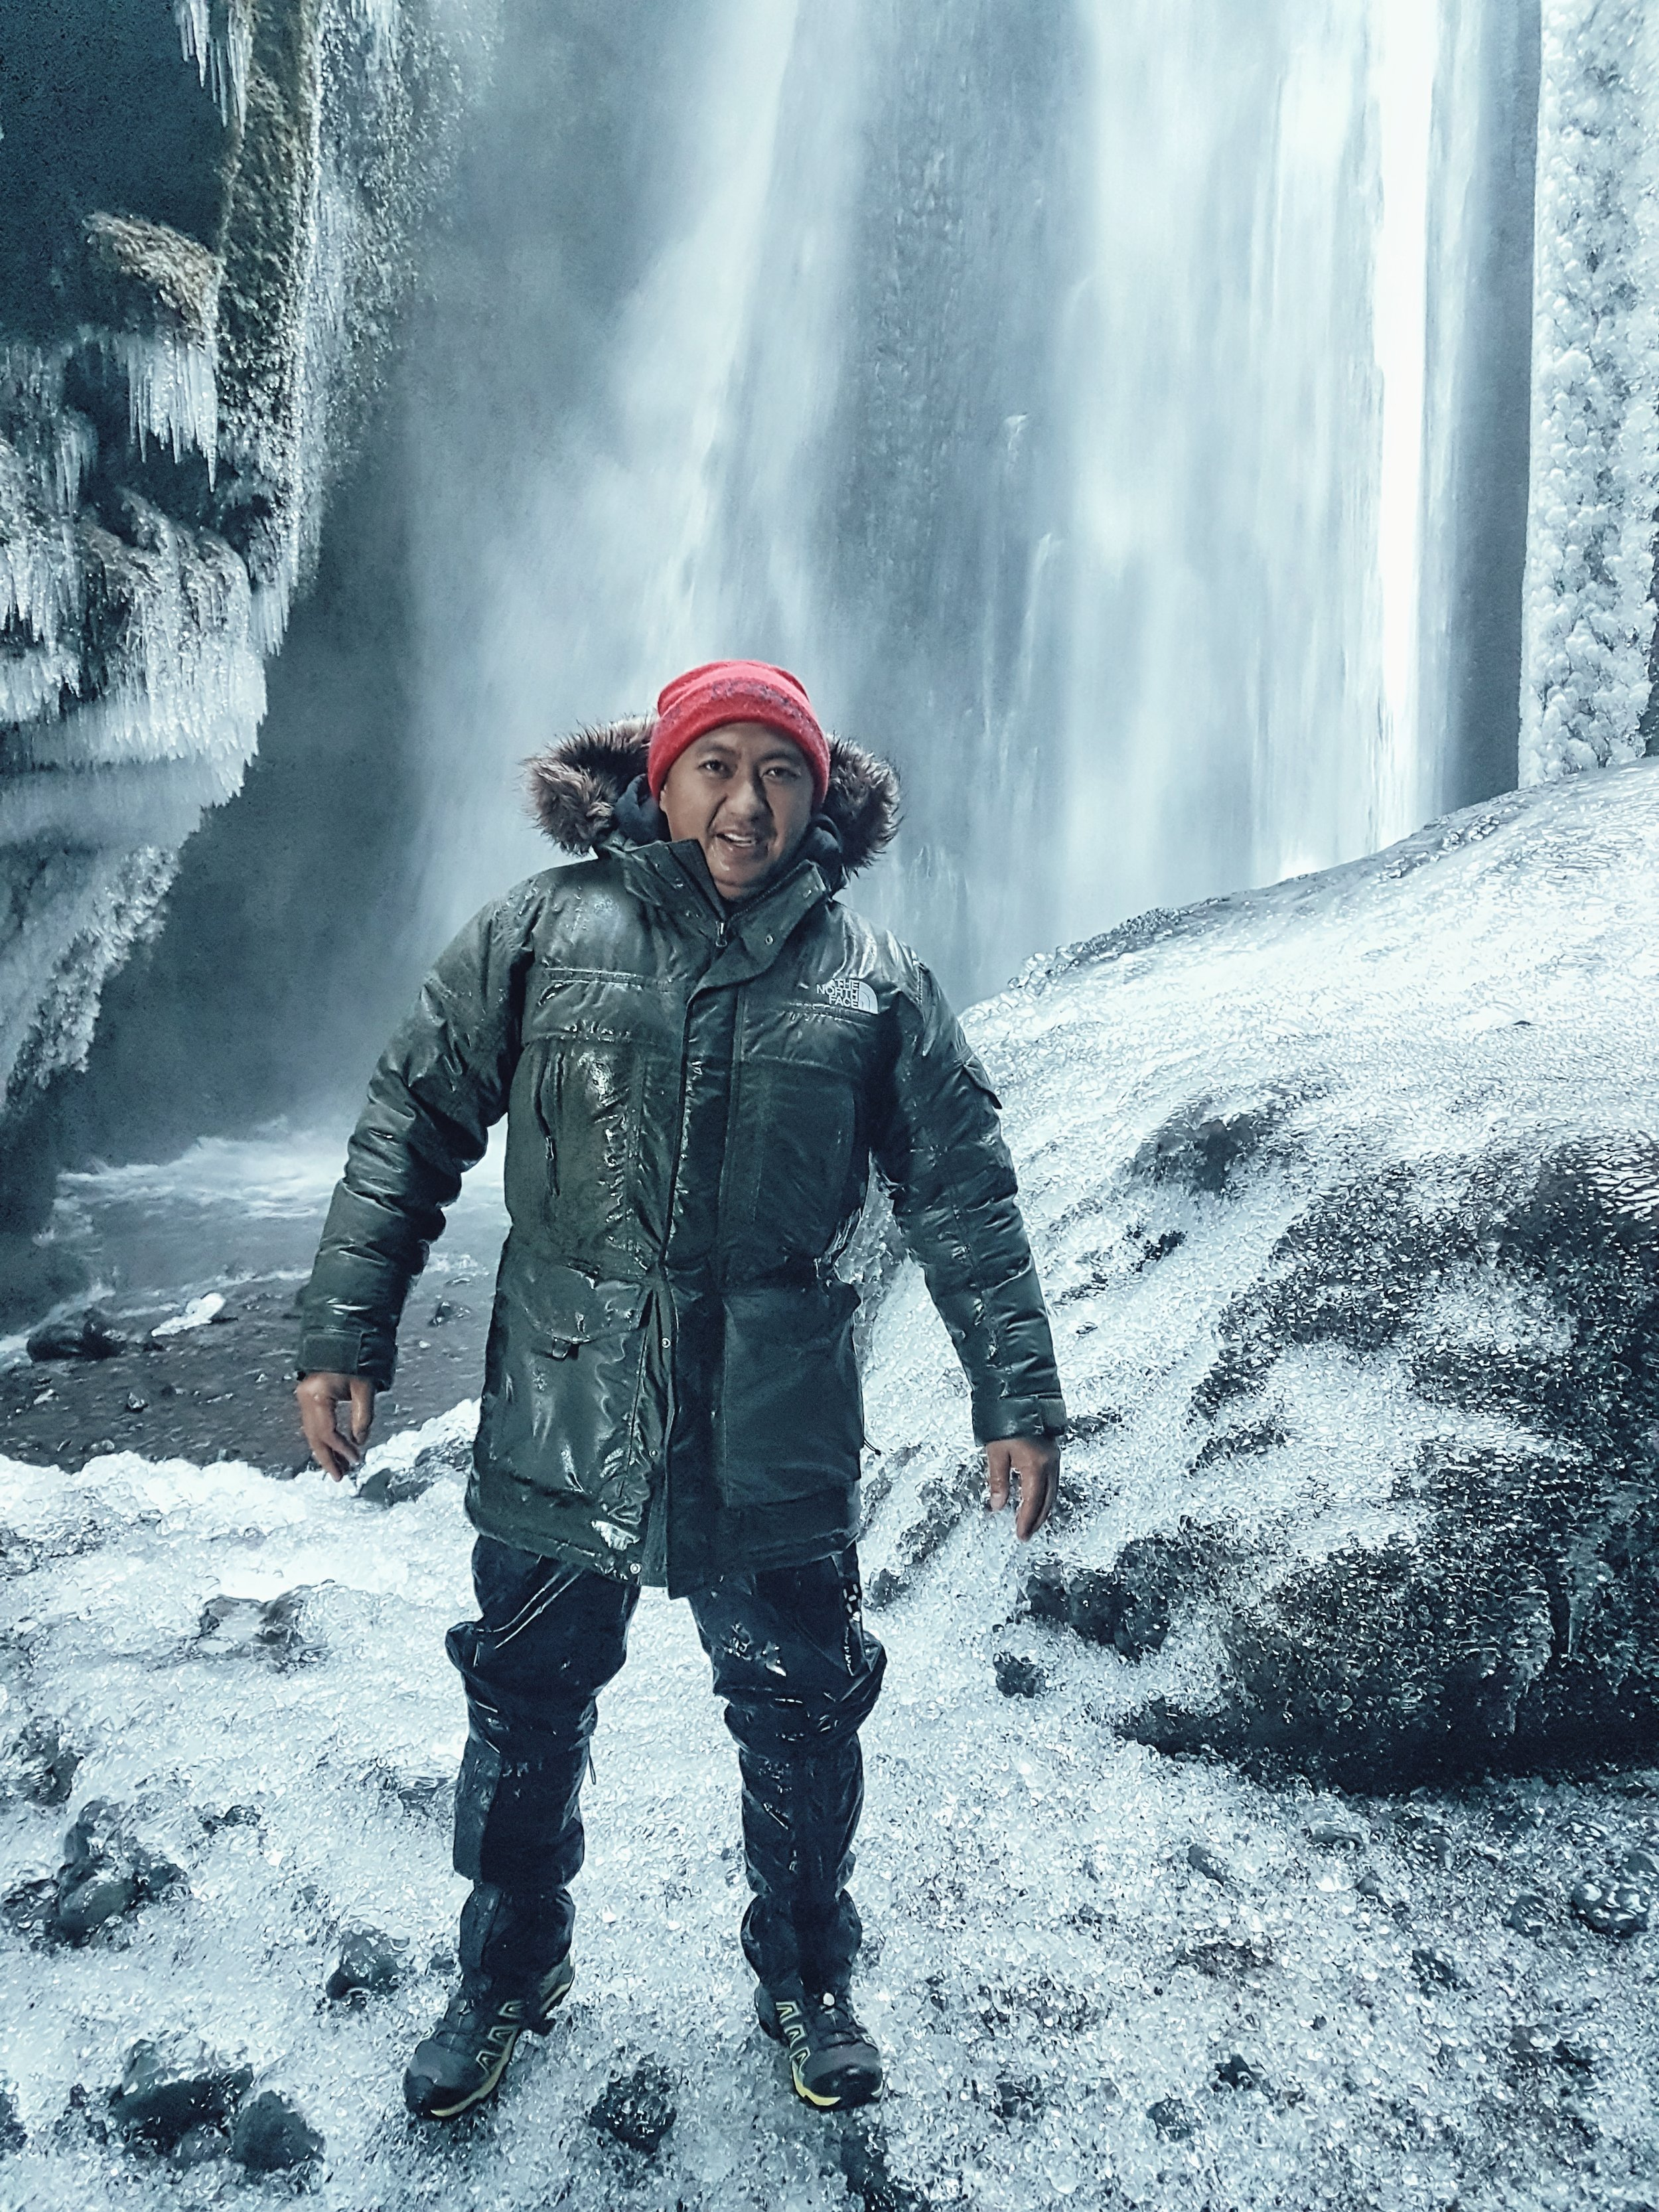 Iceland. snow. travel. adventure. photography. trip. epic landscape. snow. cold. freezing. sunrise. ivan in beast mode.jpg